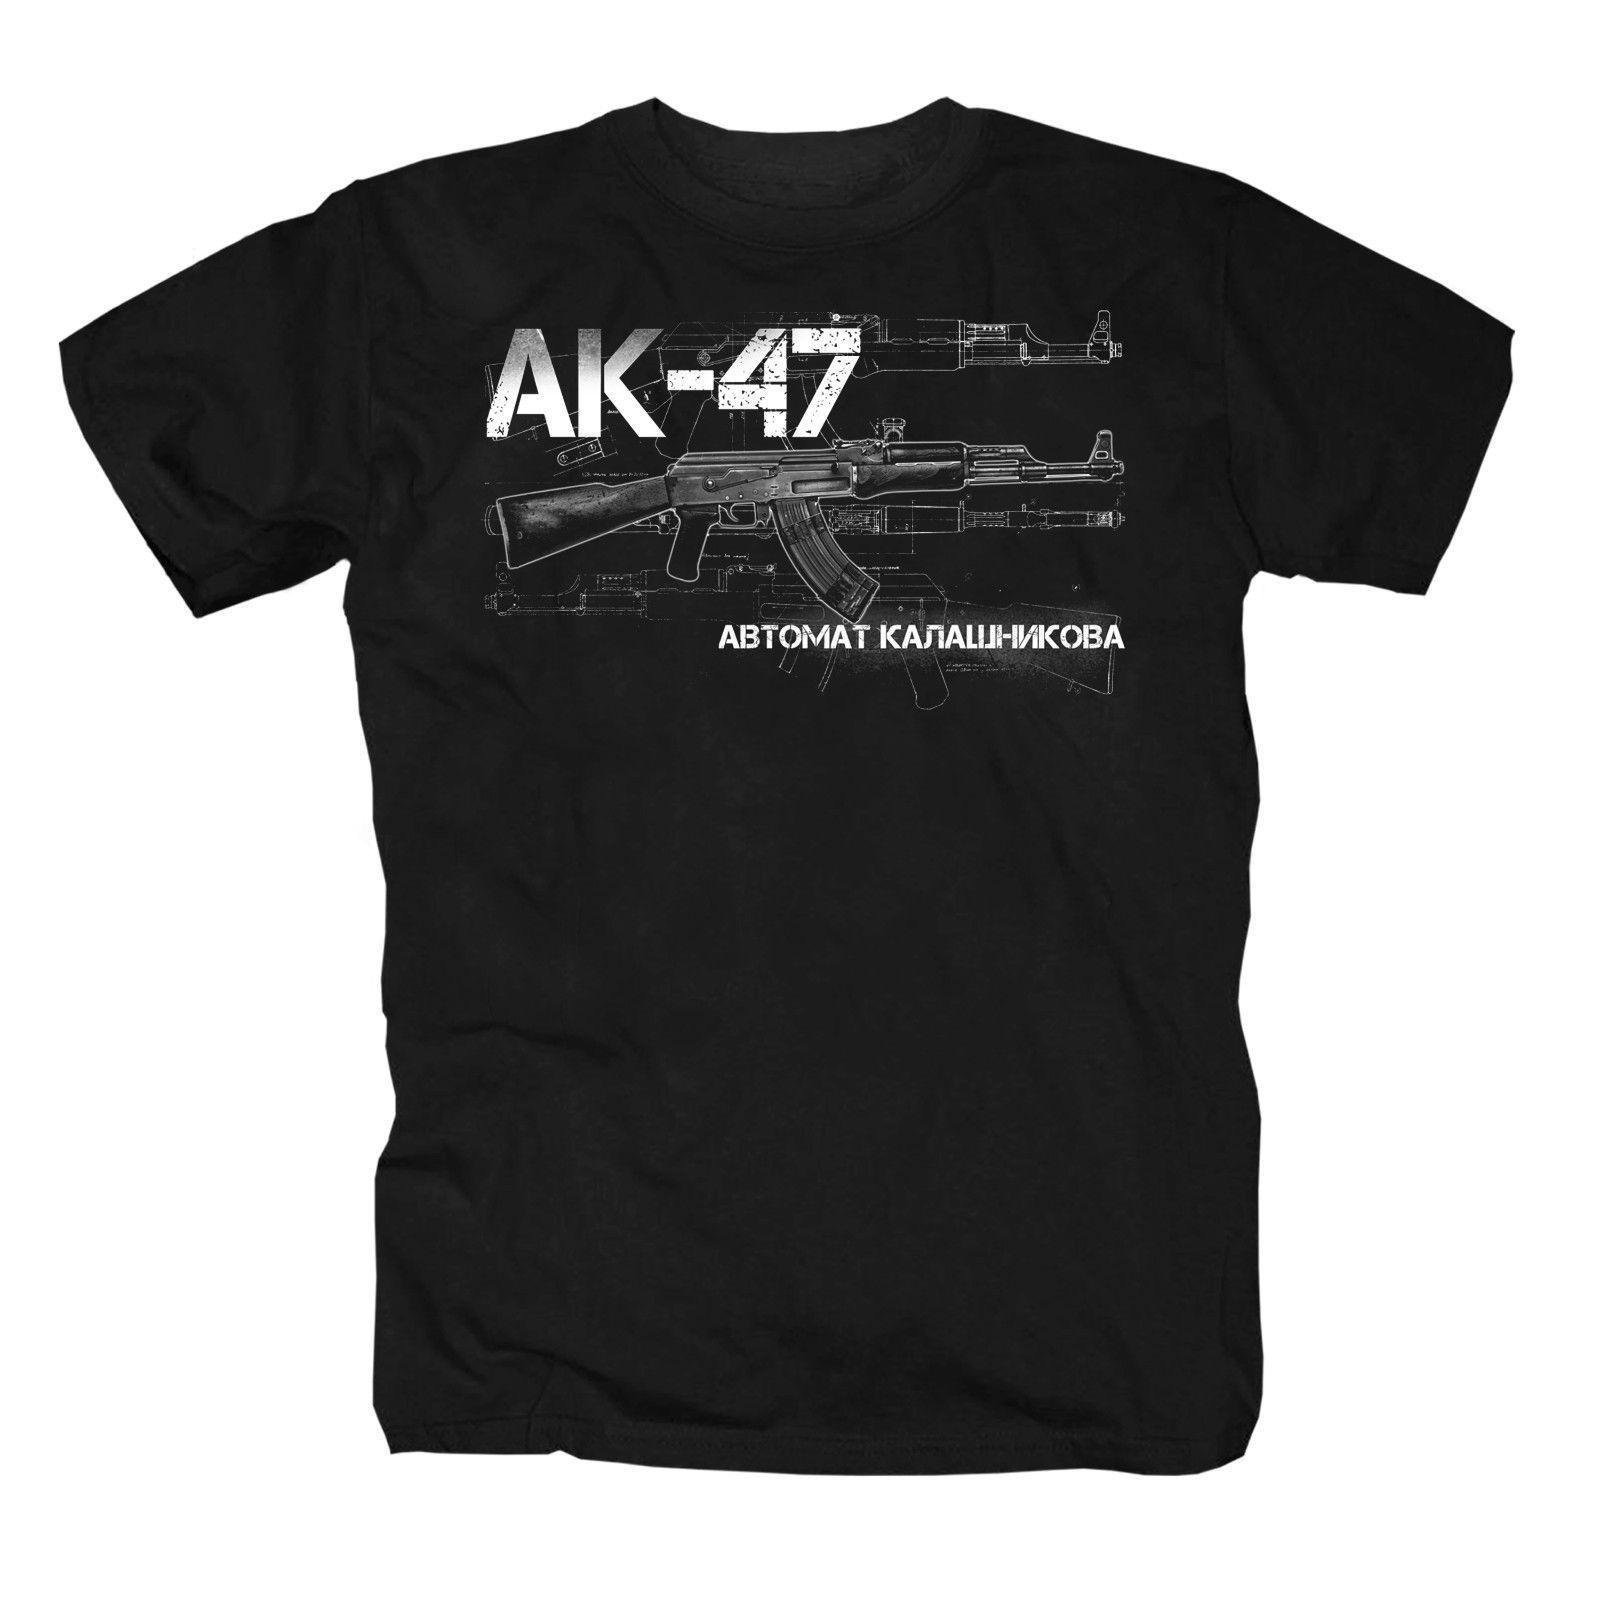 Printed Tees Male Harajuku Top Fitness Brand Clothing Shirt T-shirt Ak-47 AK47 Kalaschnikow Glock Sturmgewehr Uzi Fun Tee Shirt